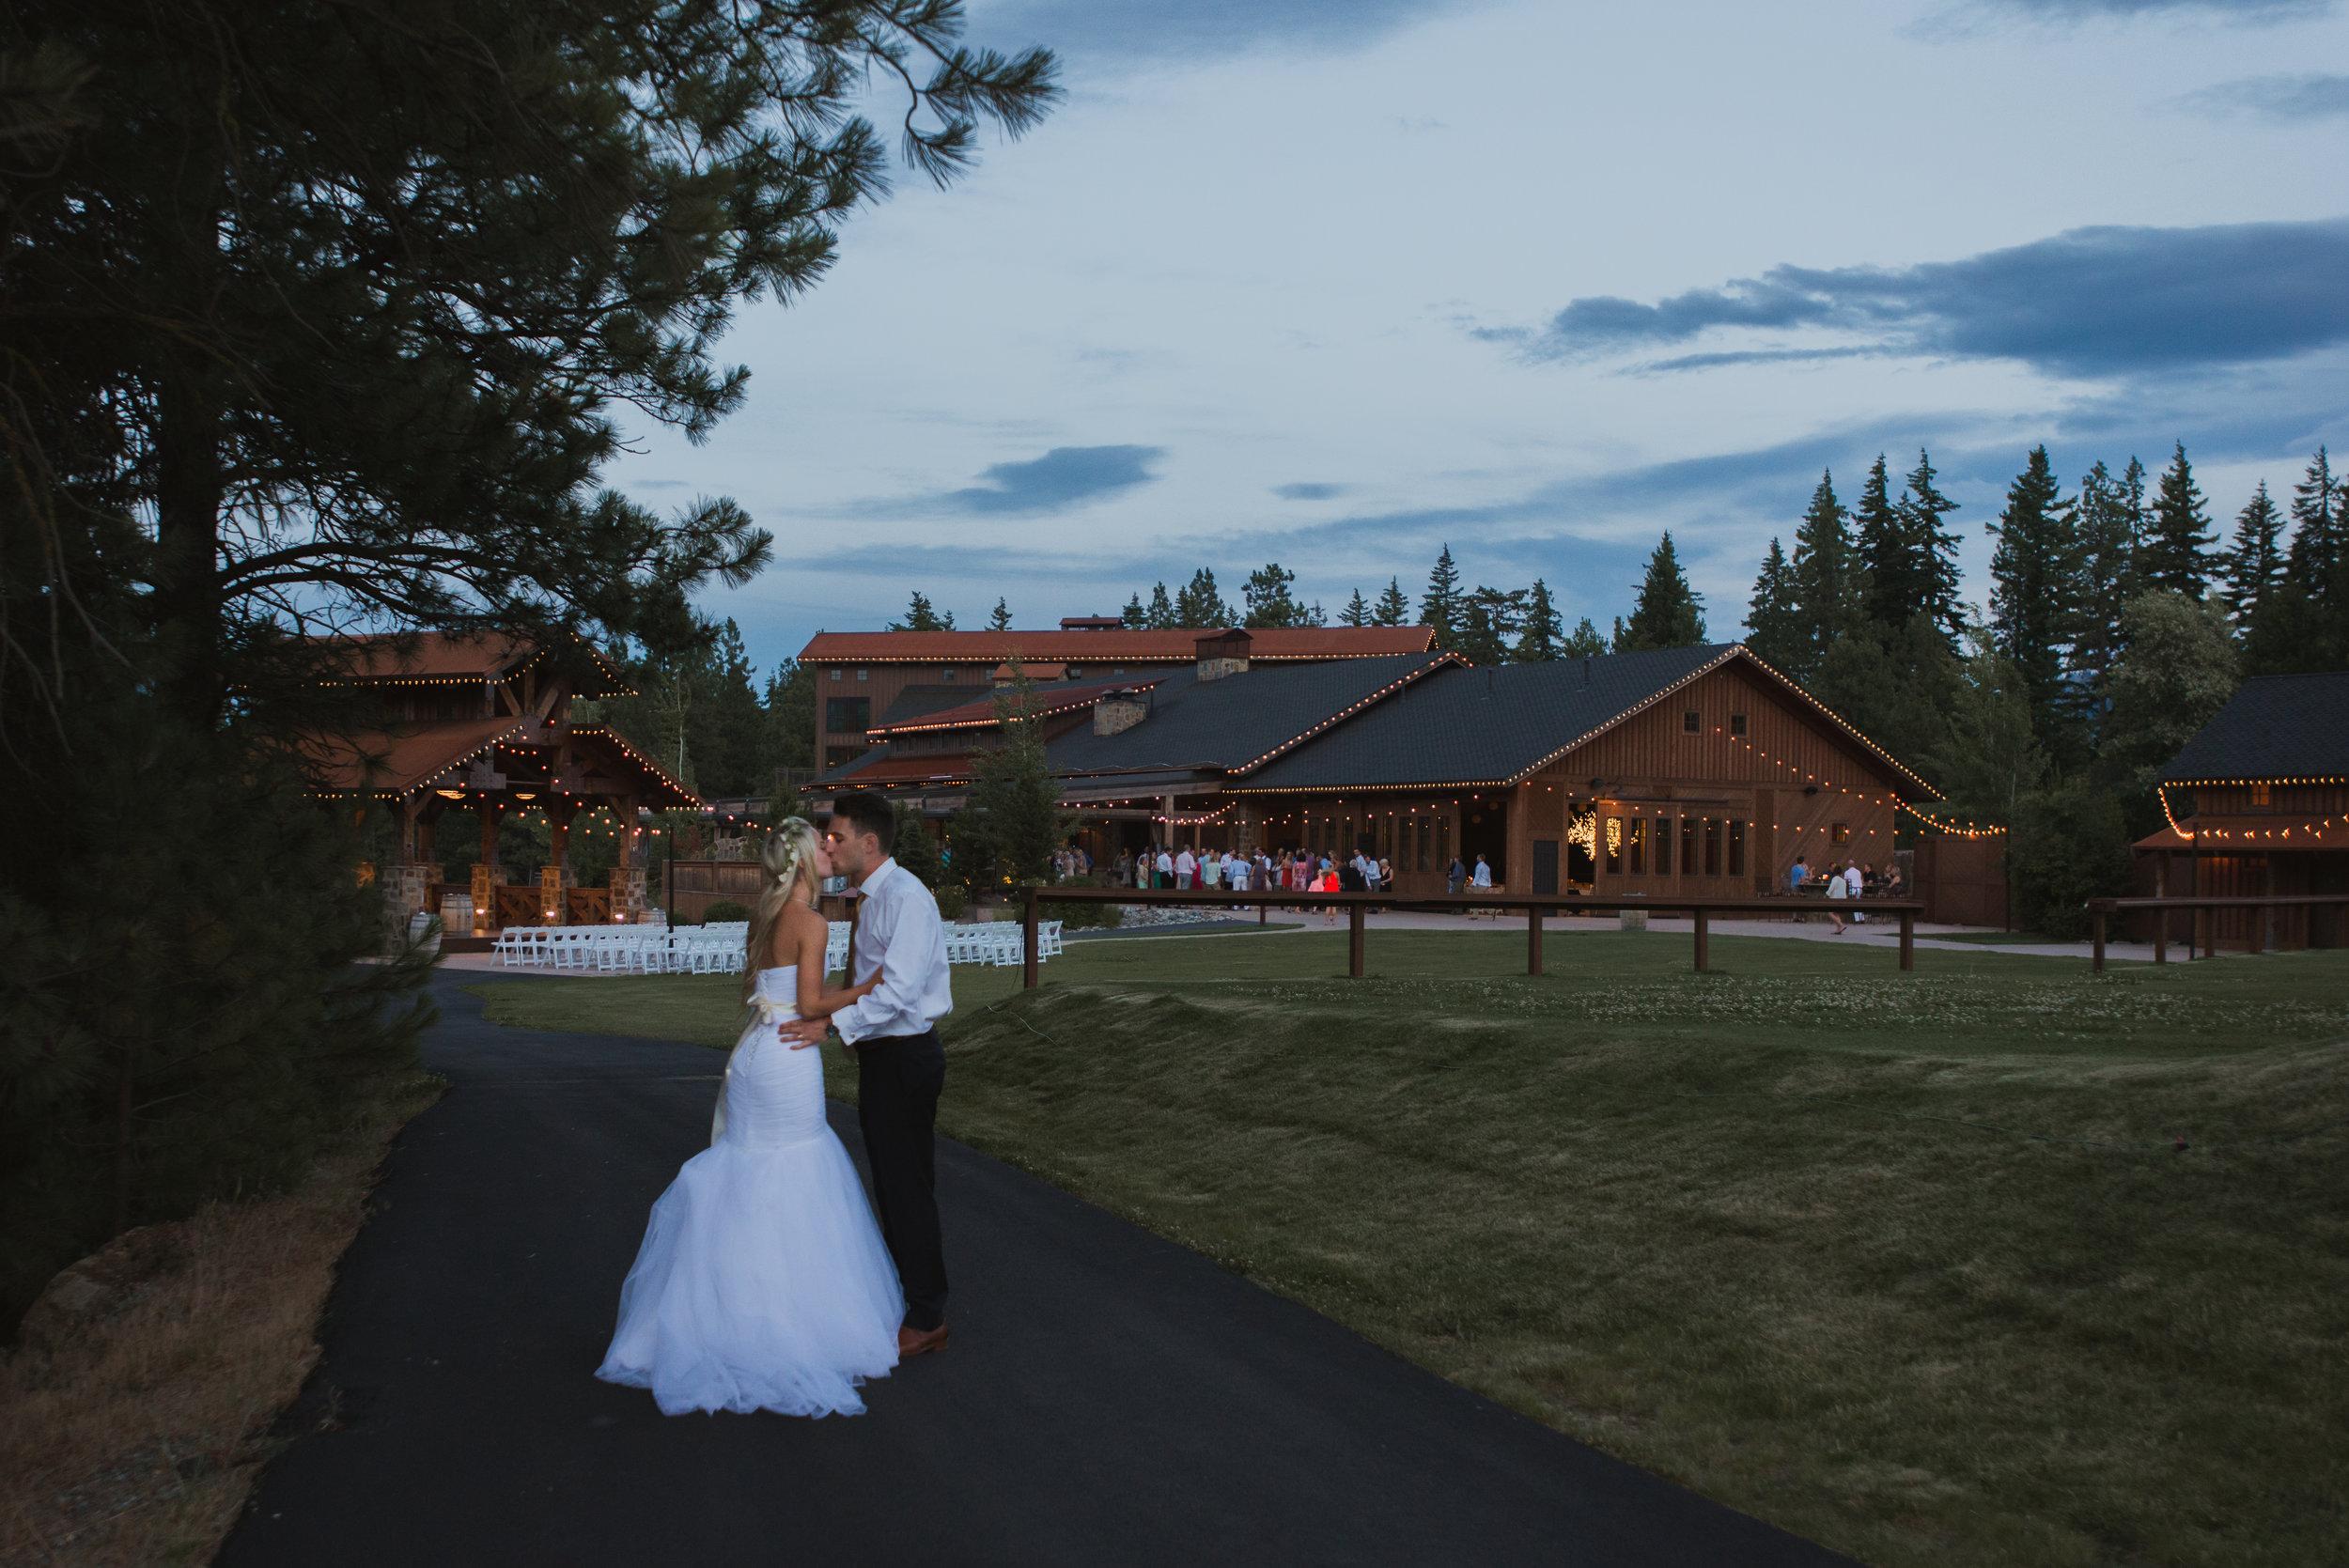 WEYER-WEDDING-DANCING-27.jpg